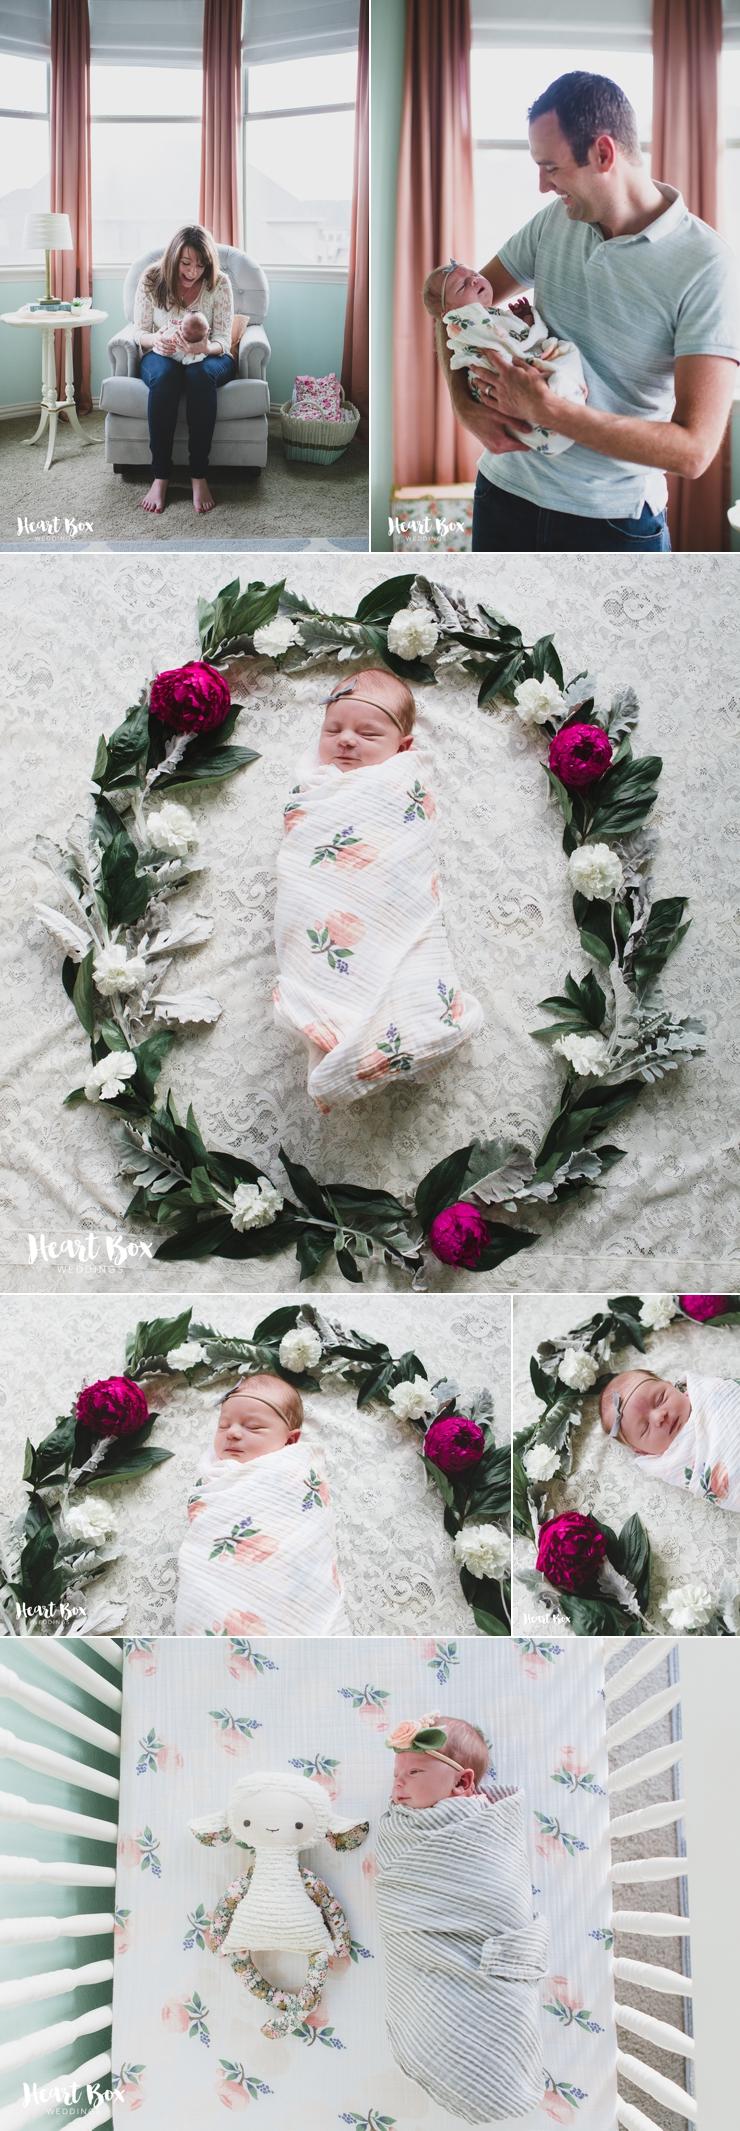 Emma Jackson Newborn Blog Collages 4.jpg